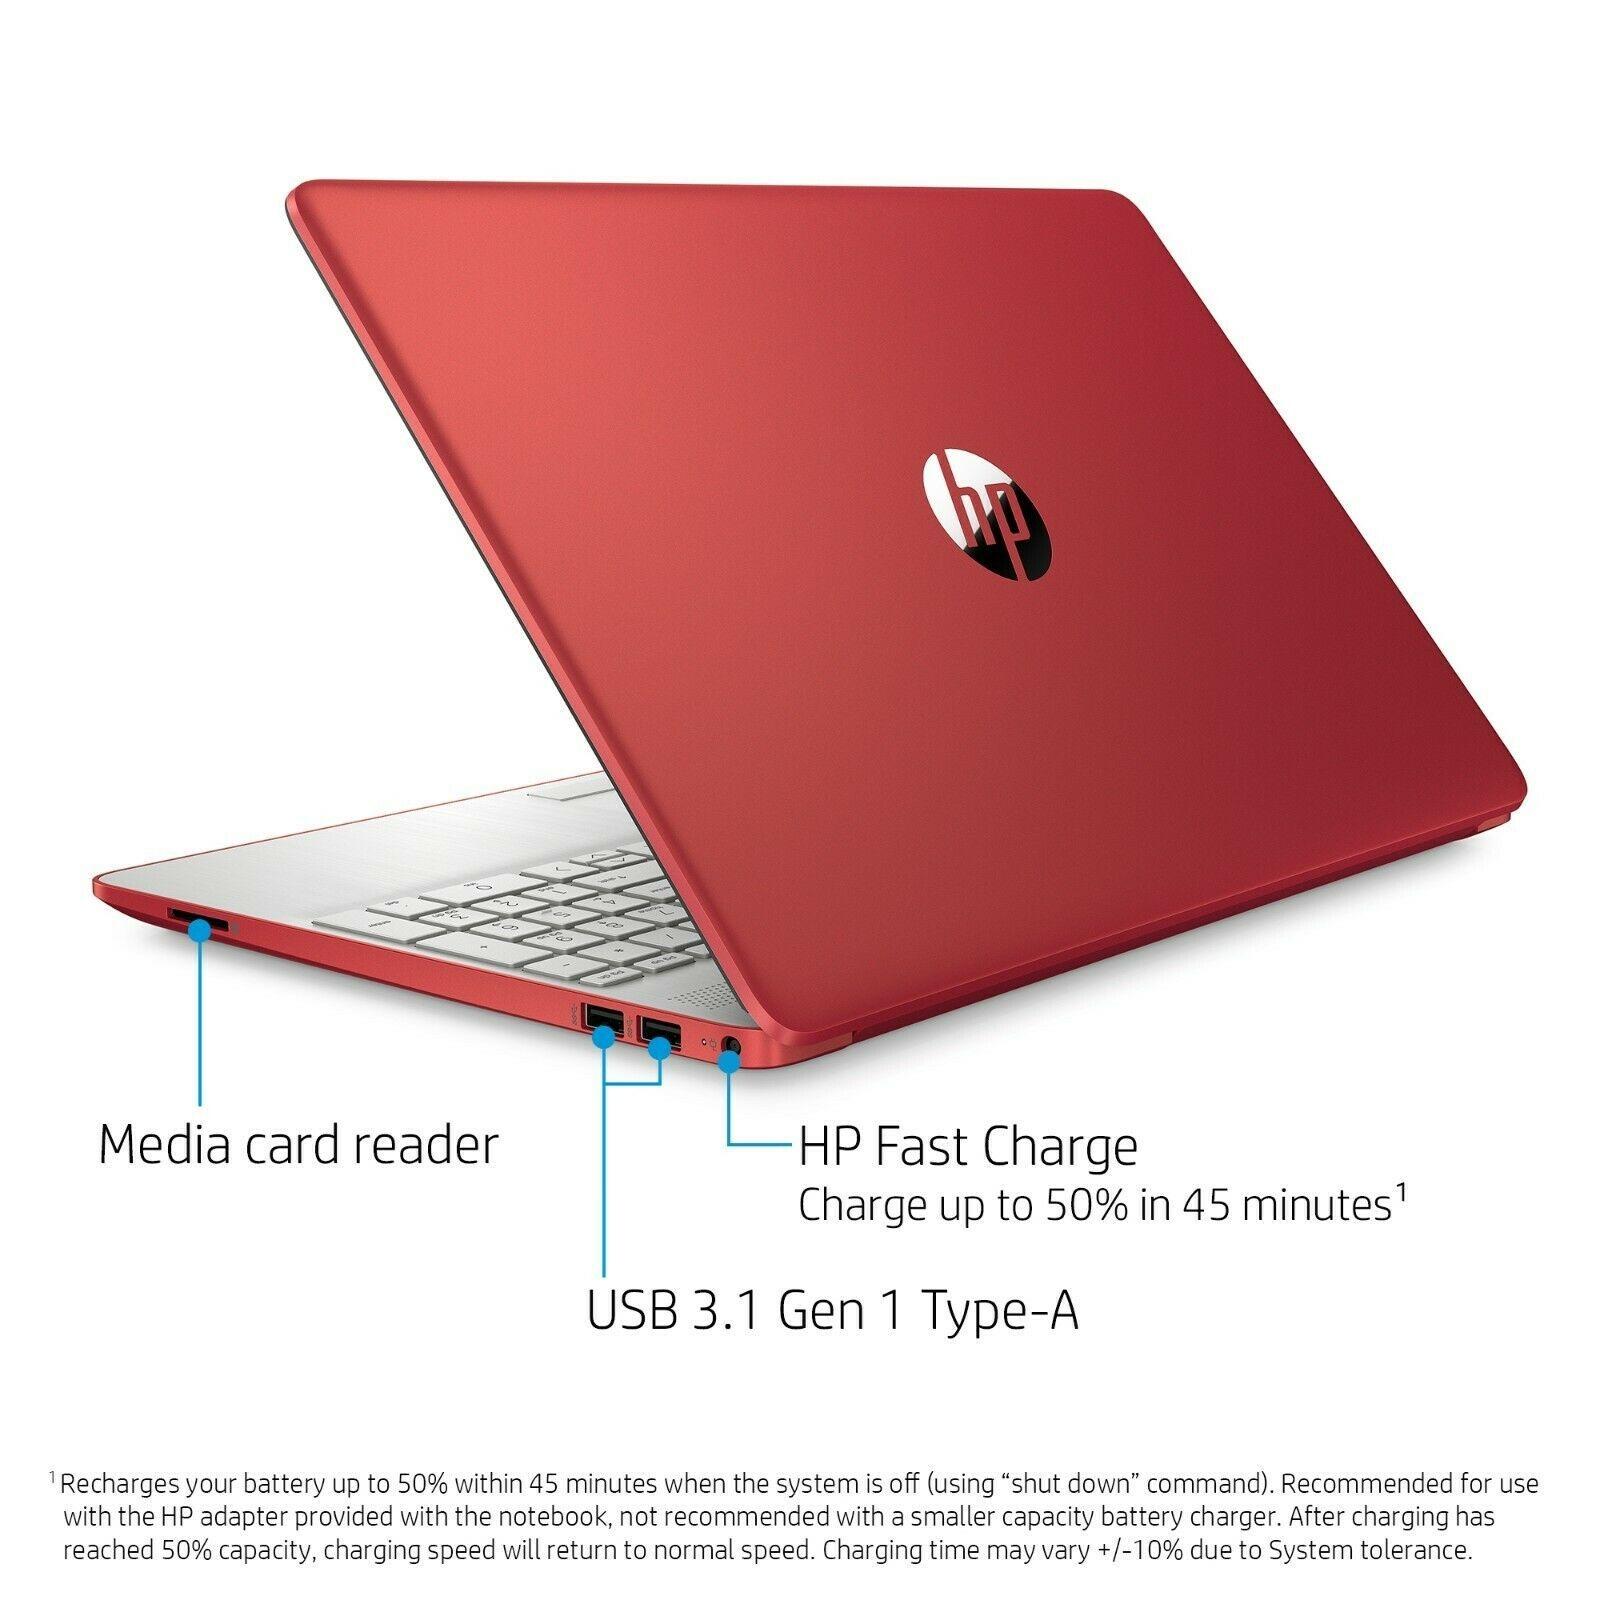 HP 15-DW0081WM 15.6 in 500 GB Intel Pentium 2.70 GHz 4GB Laptop - Red -  1A406UA for sale online - eBay